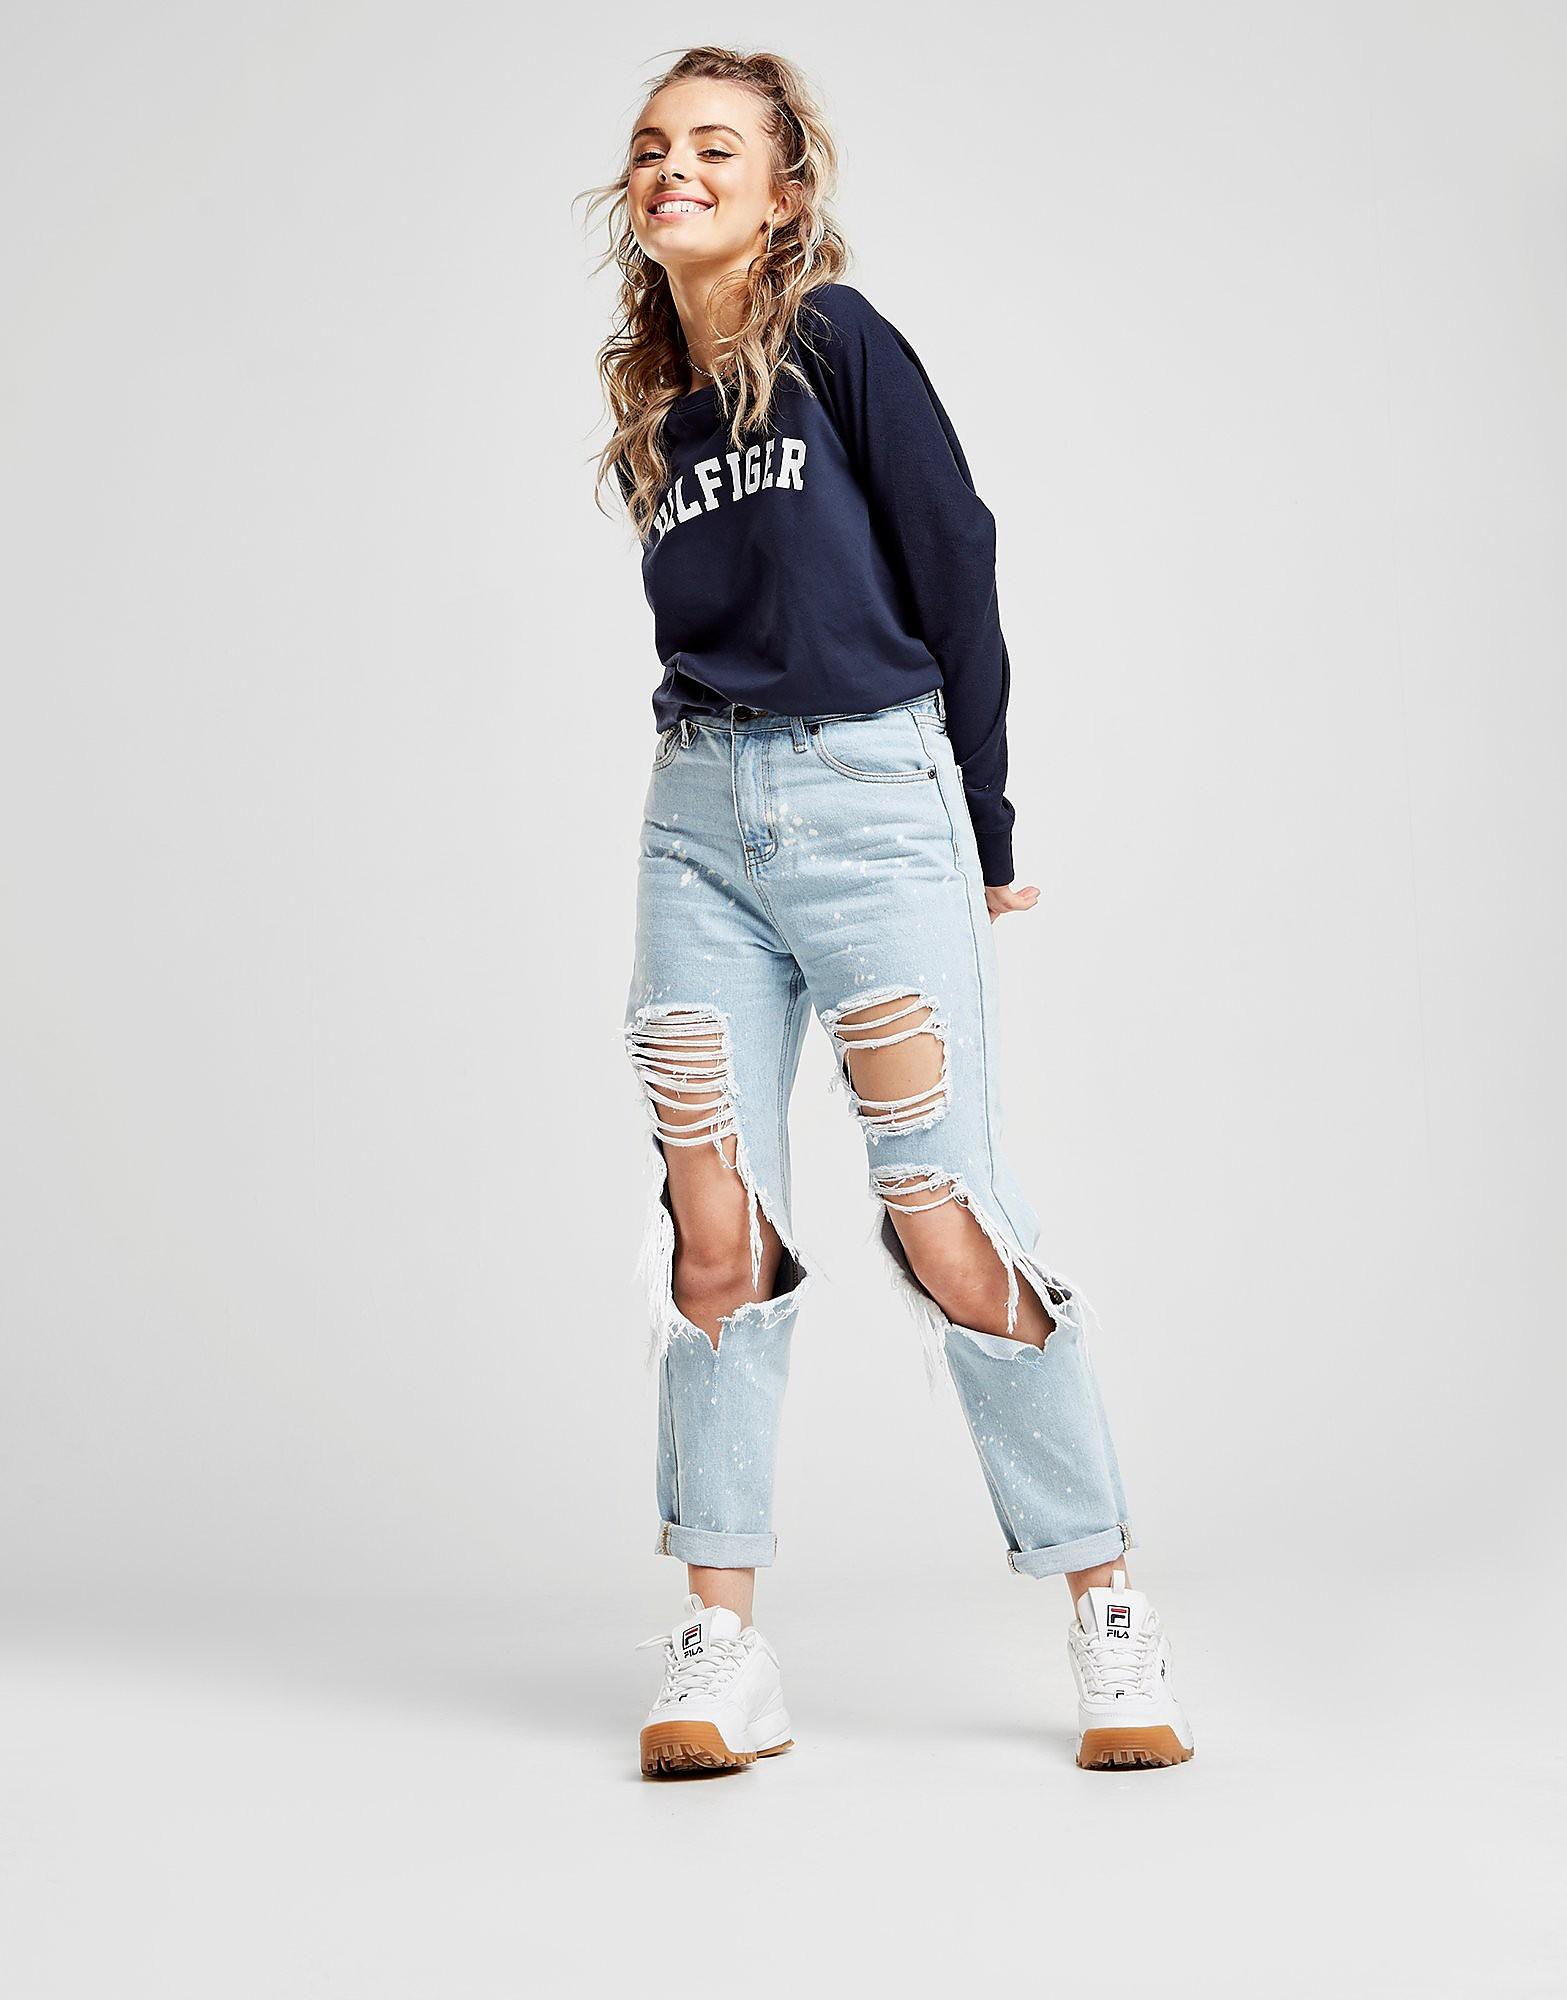 Tommy Hilfiger Lounge Sweatshirt